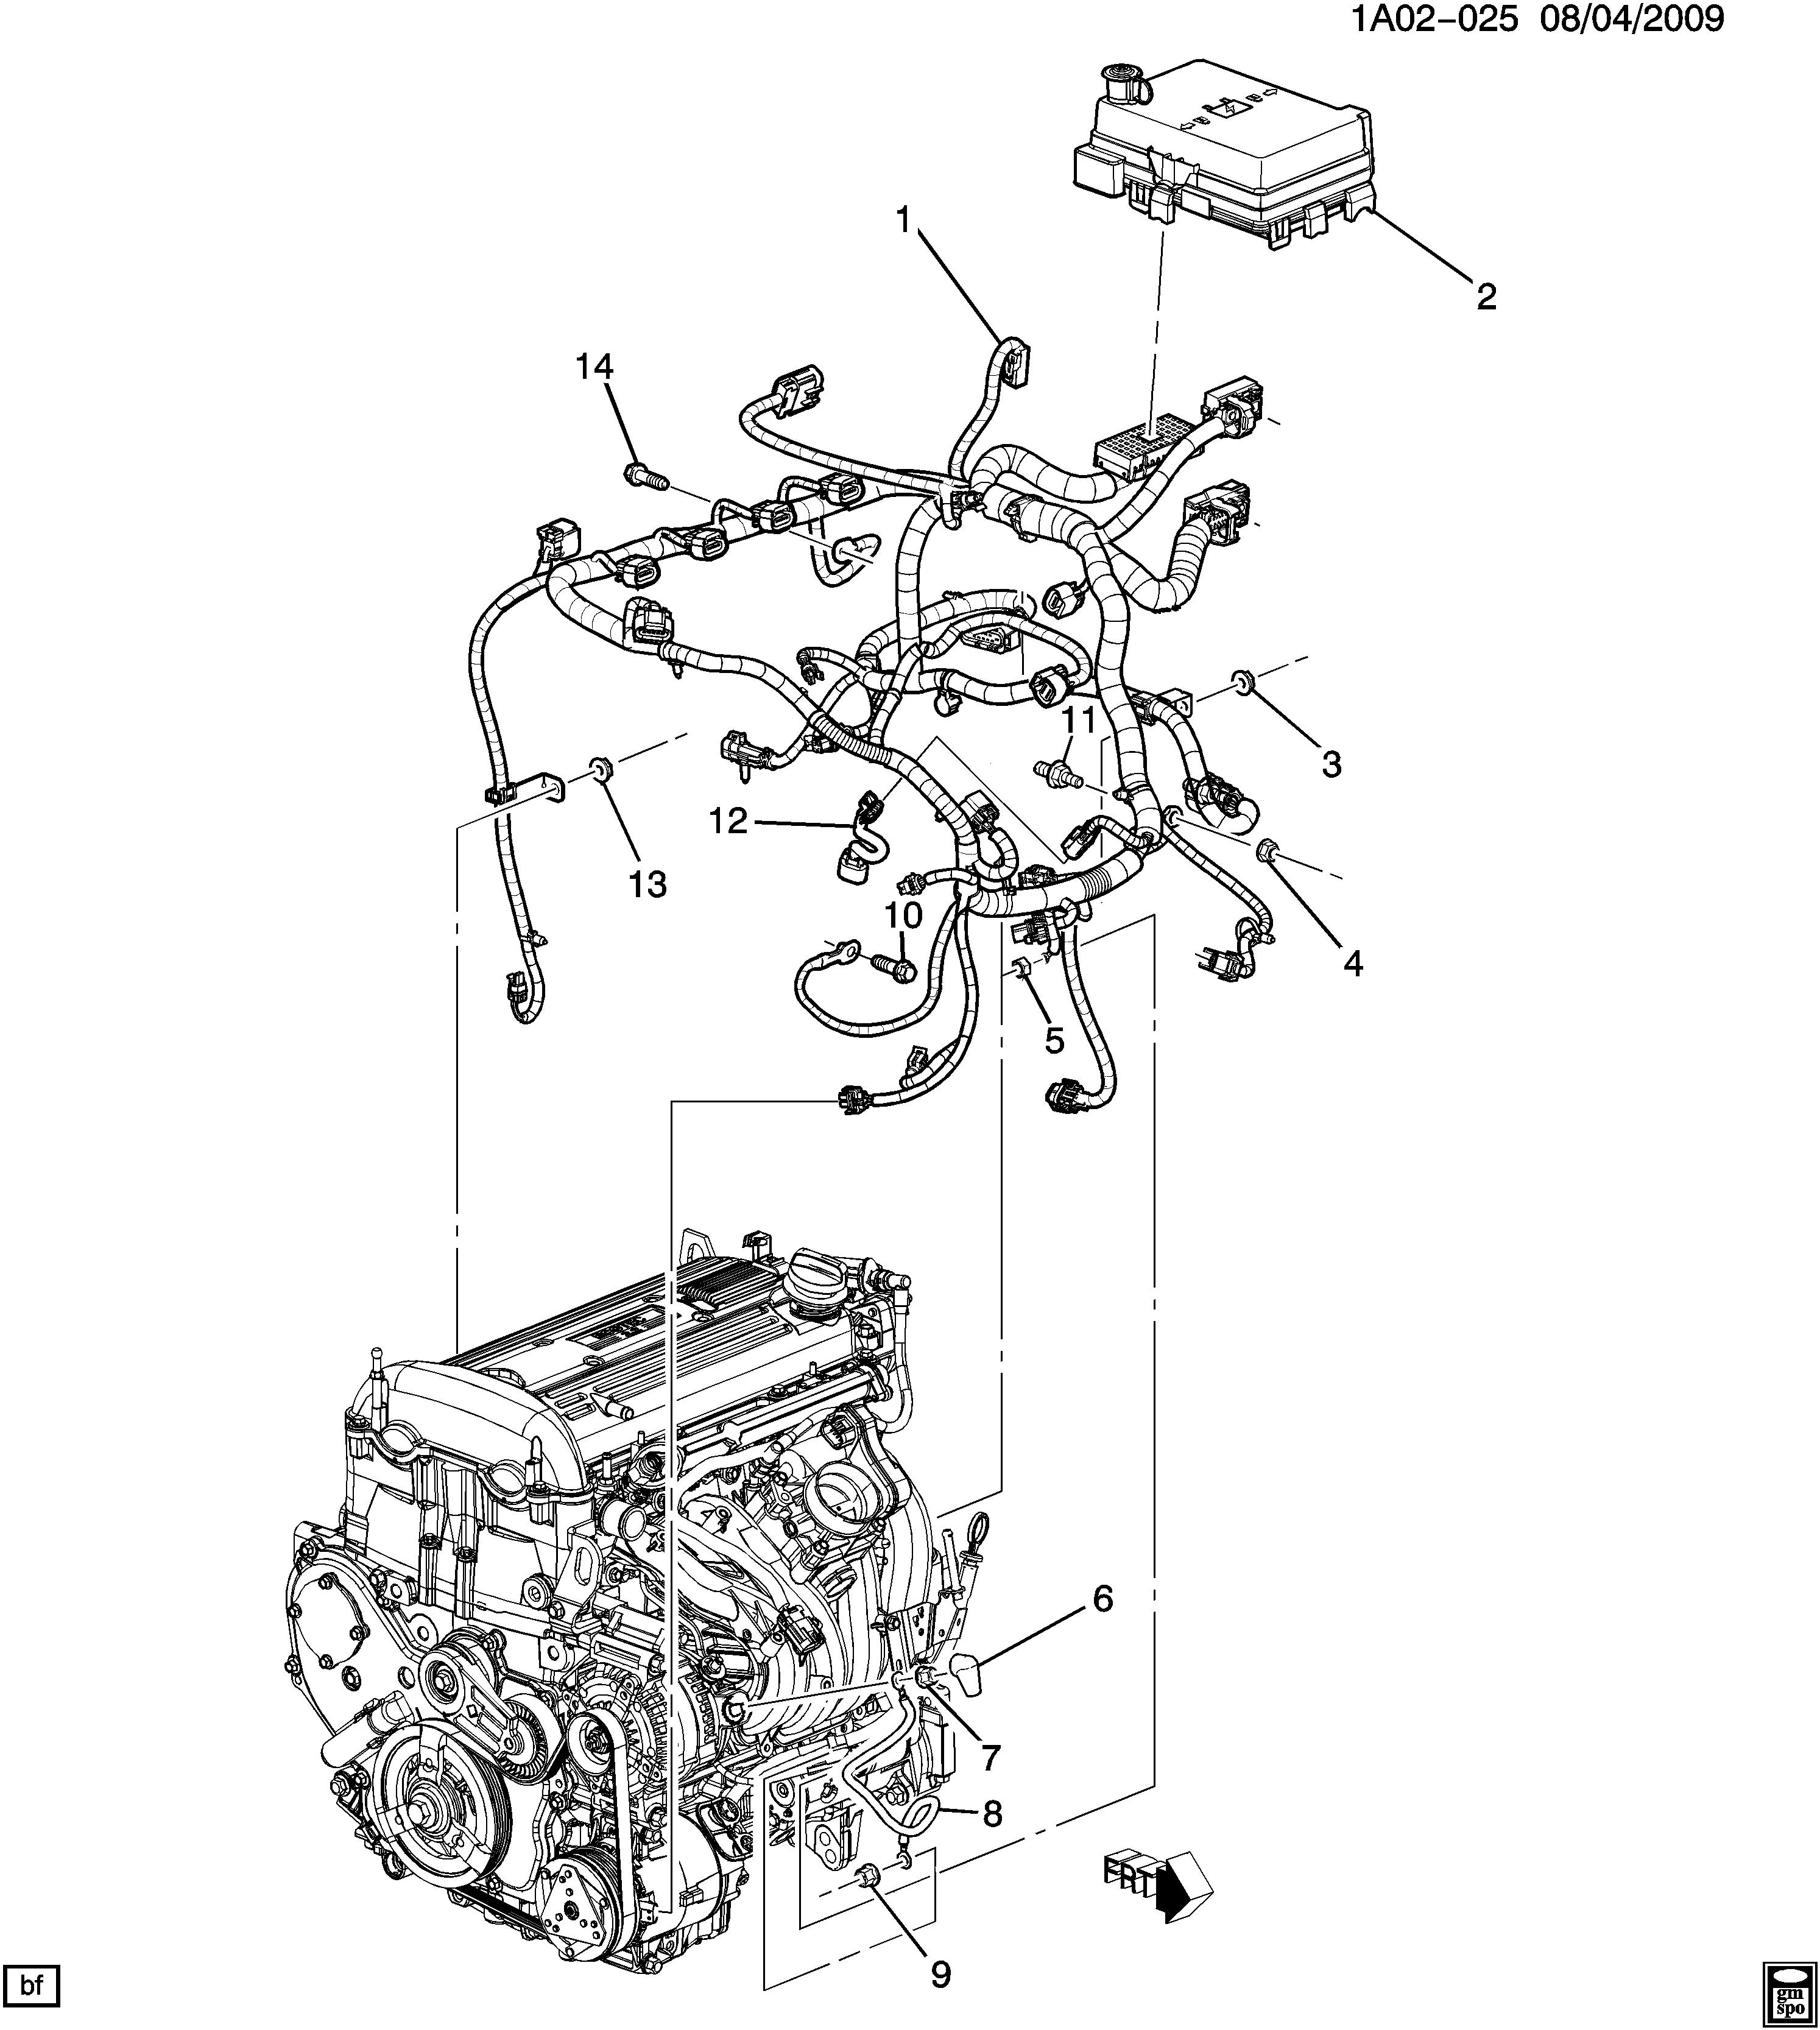 2007 Chevrolet Cobalt Wiring Diagram